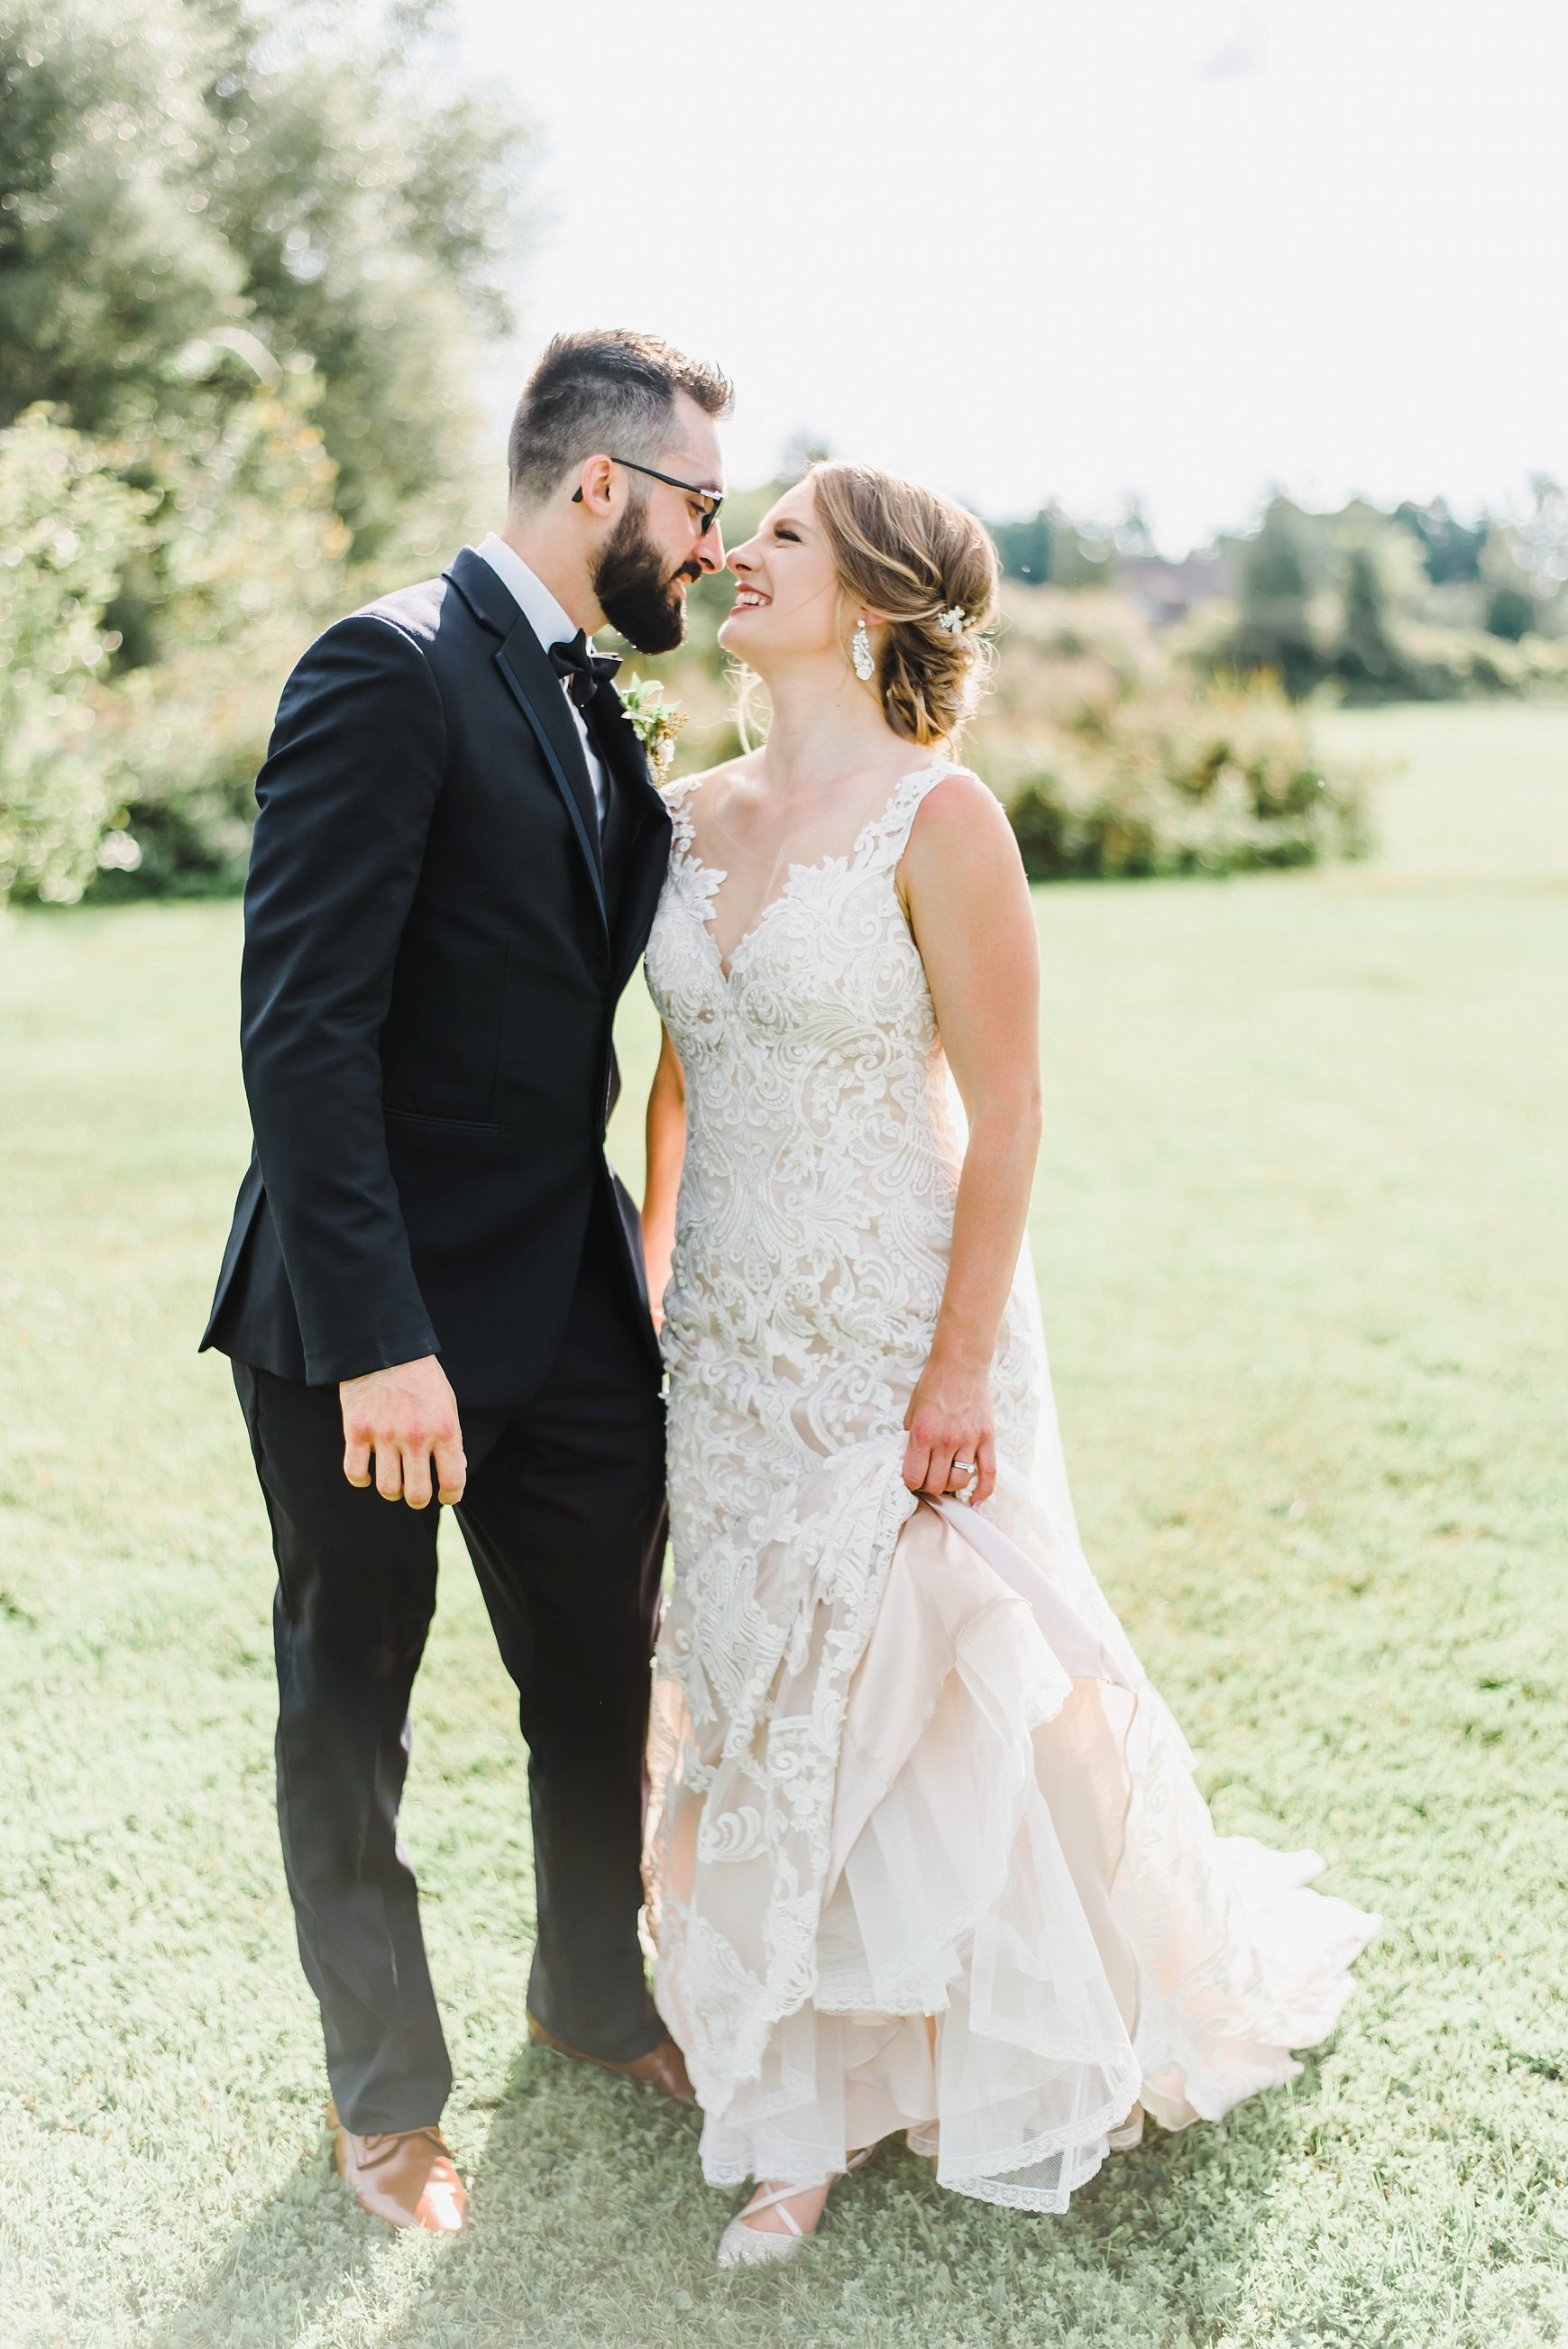 light airy indie fine art ottawa wedding photographer | Ali and Batoul Photography_1322.jpg